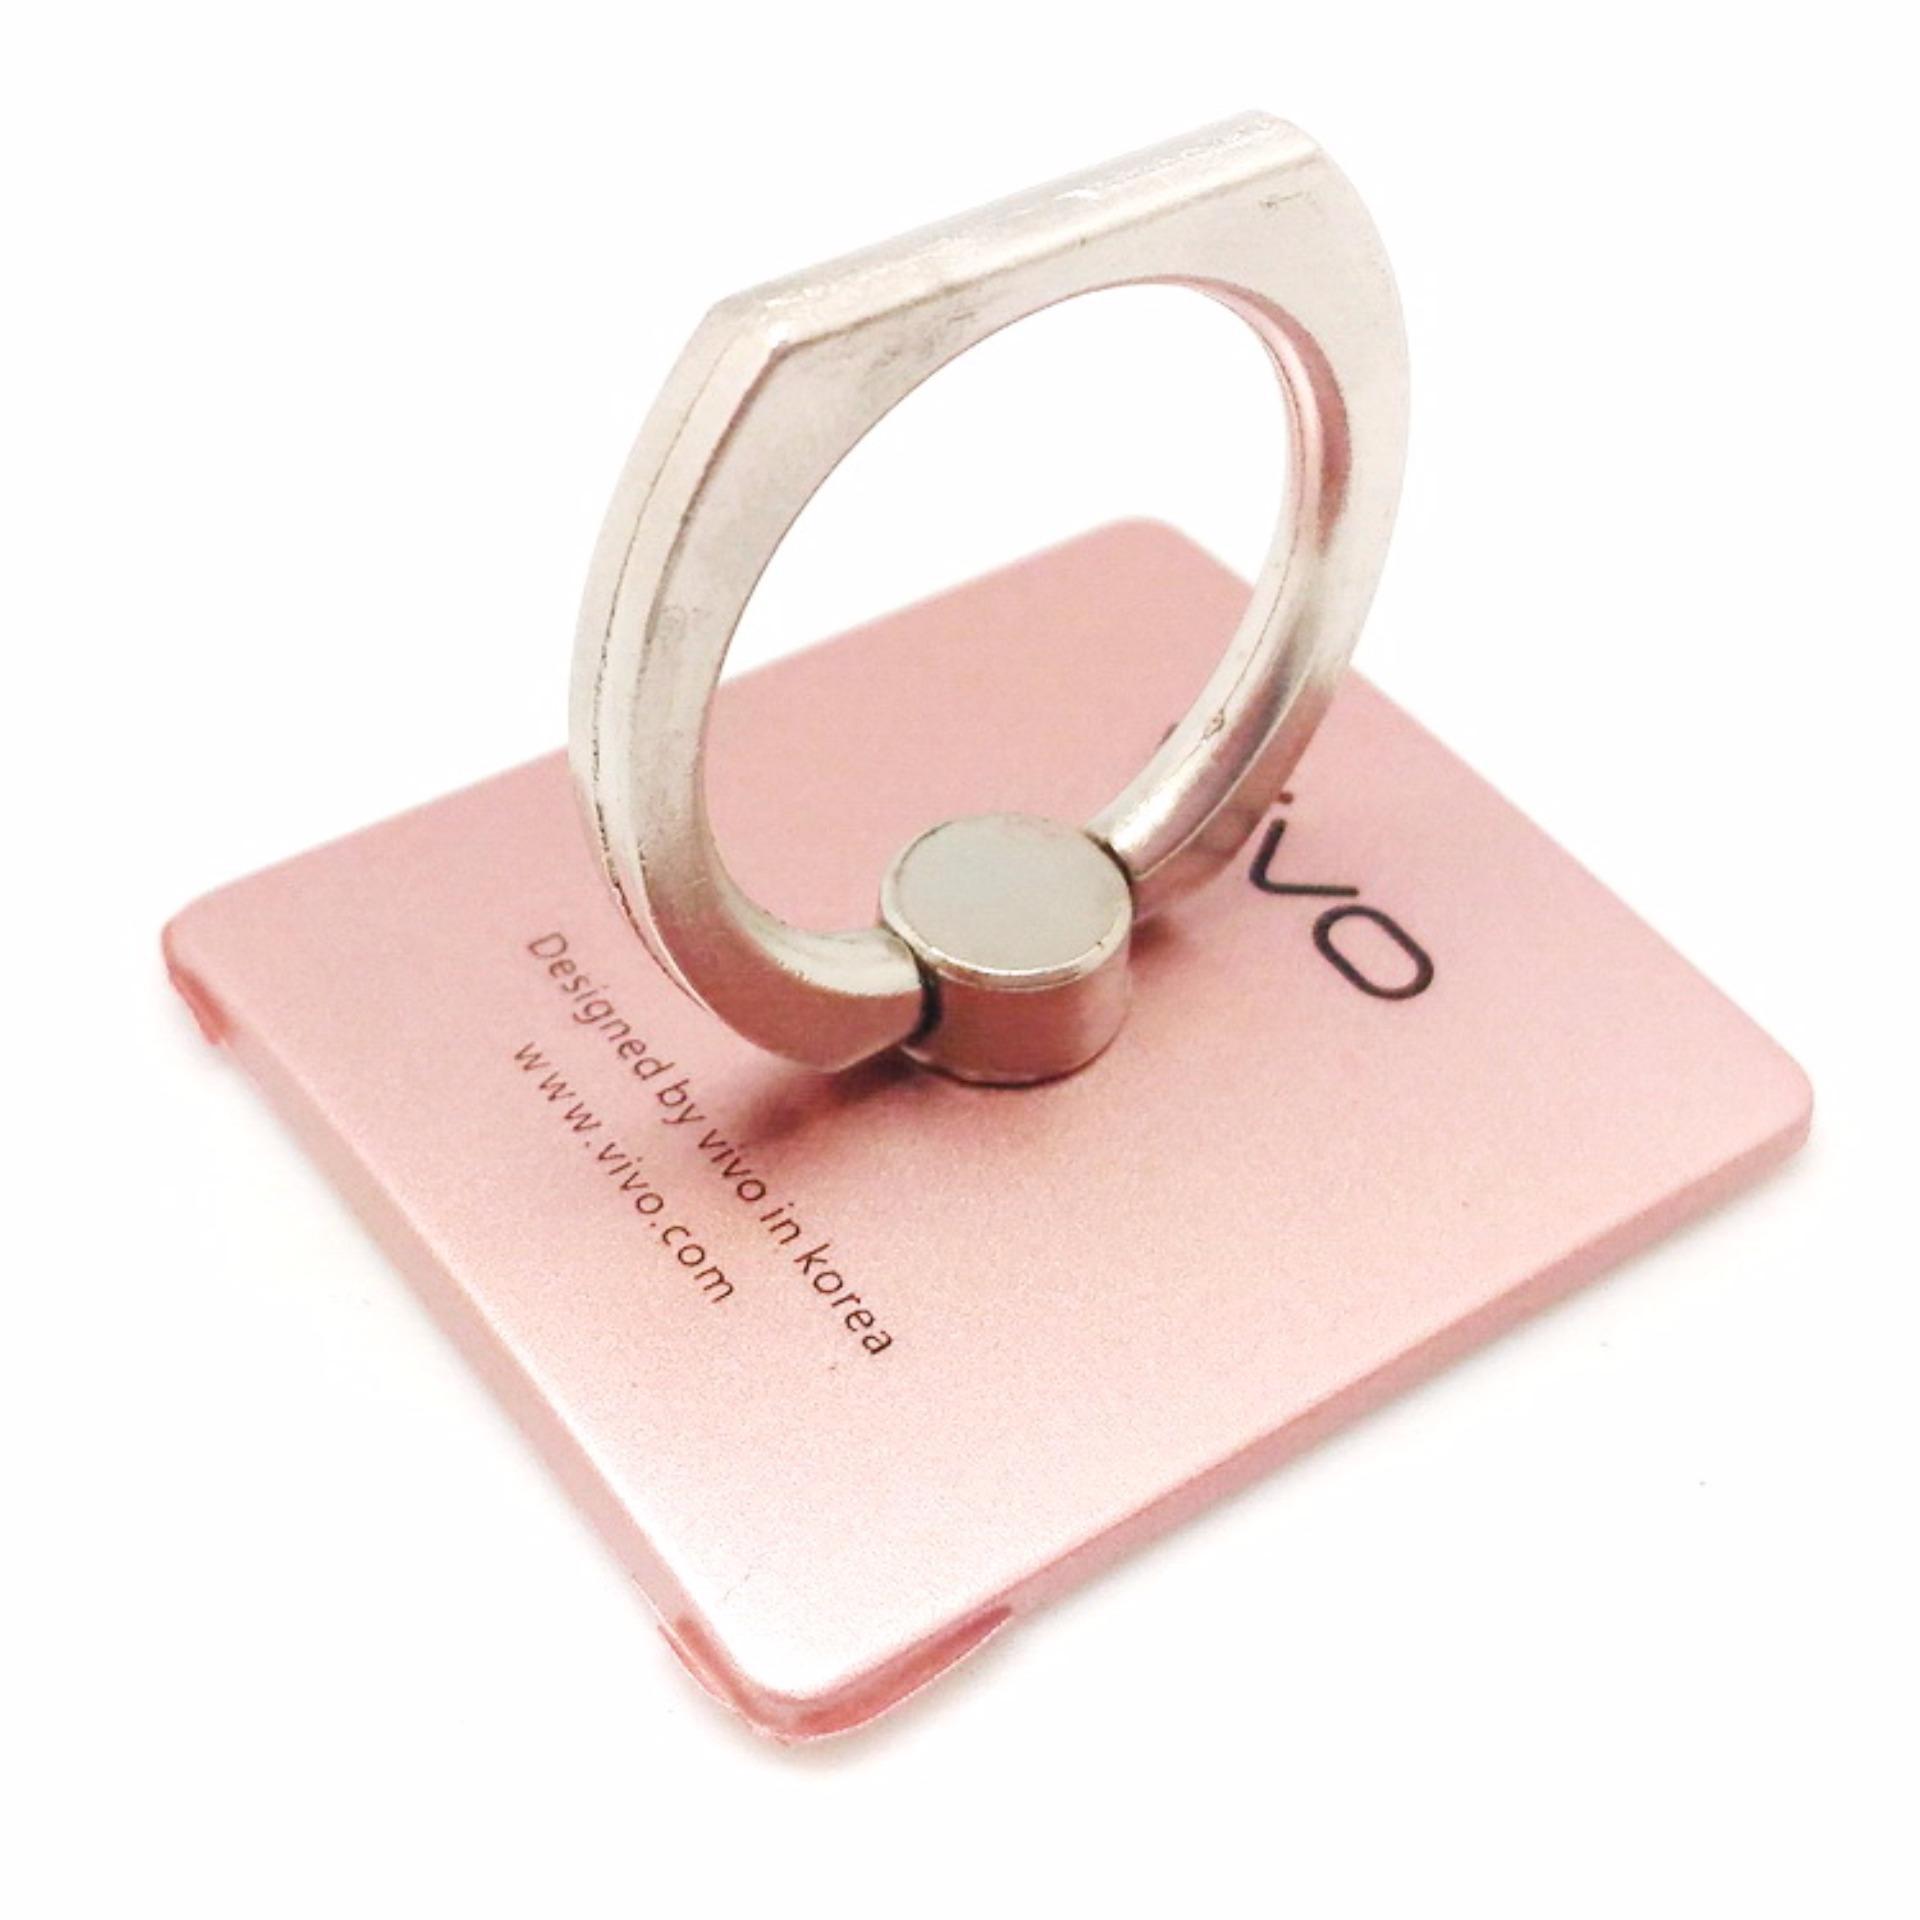 iRing Smartphone Grip - iRing Stand Phone Holder 360 Degree Rotation - Pink .